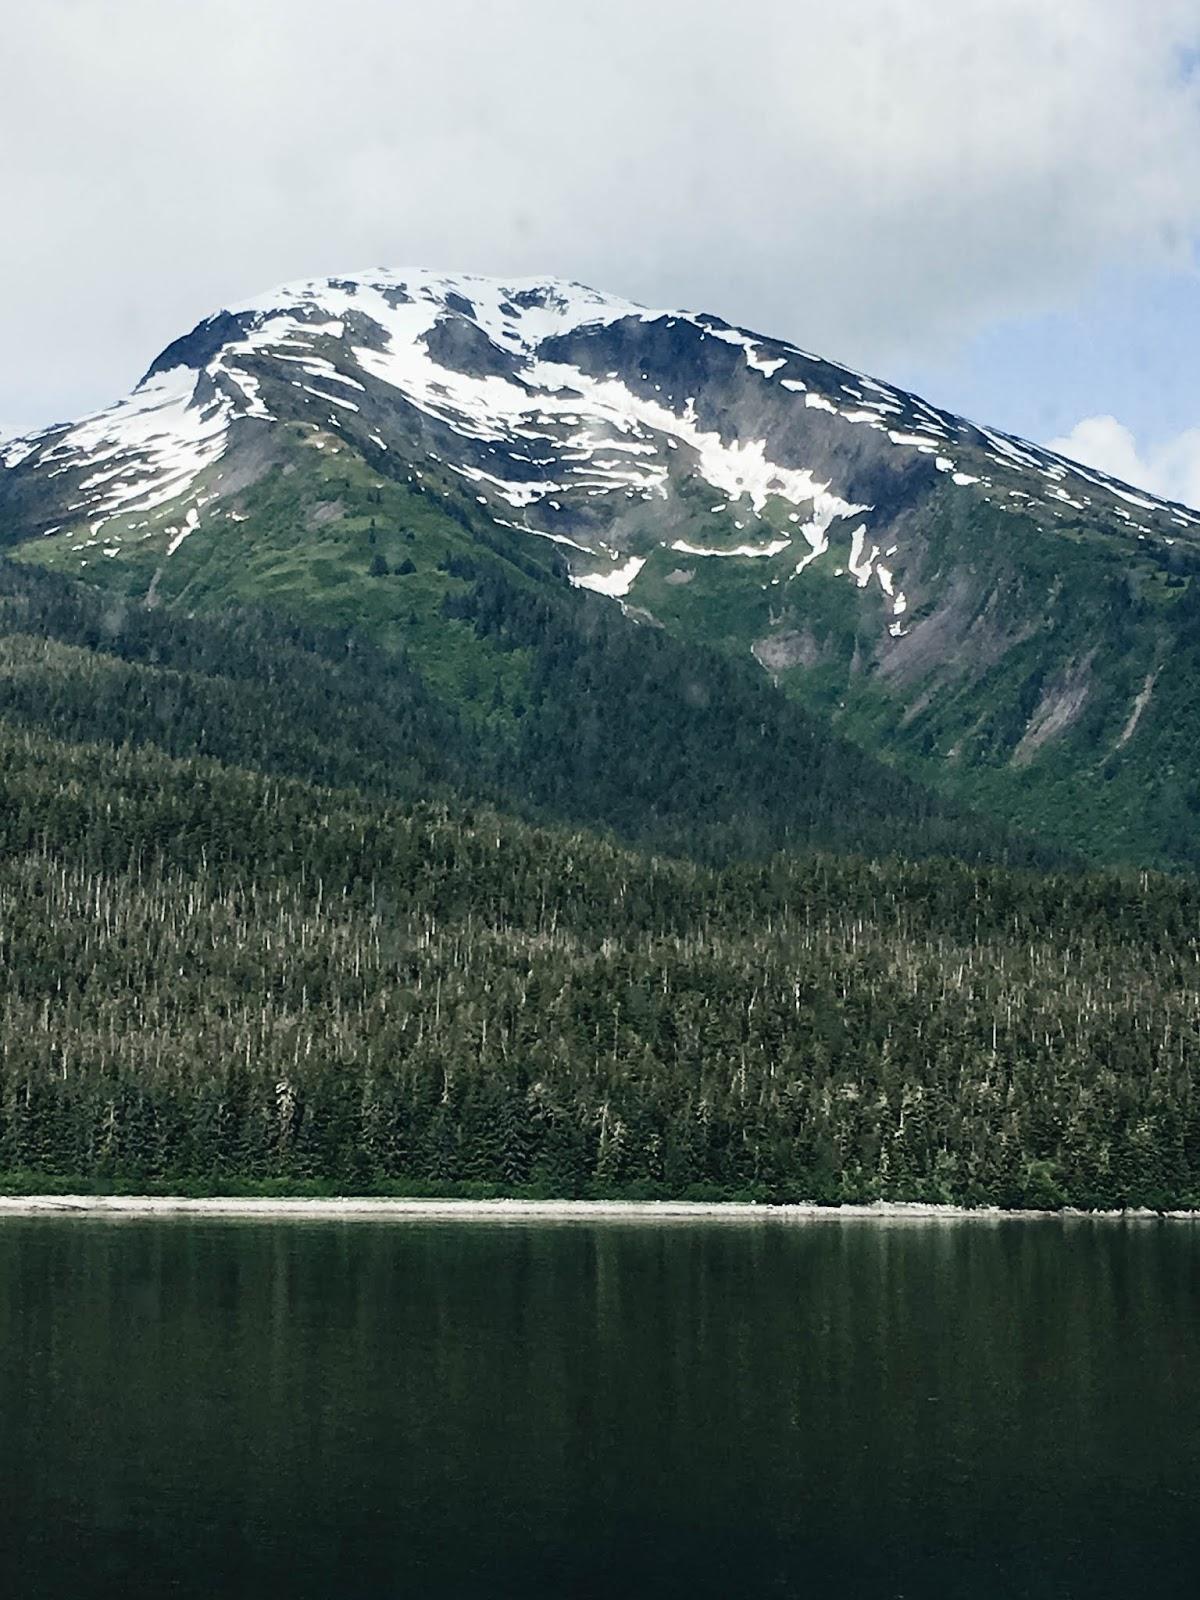 summer2017-14day-hollandamerica-cruiseline-alaskan-cruise-alaska-glaciers